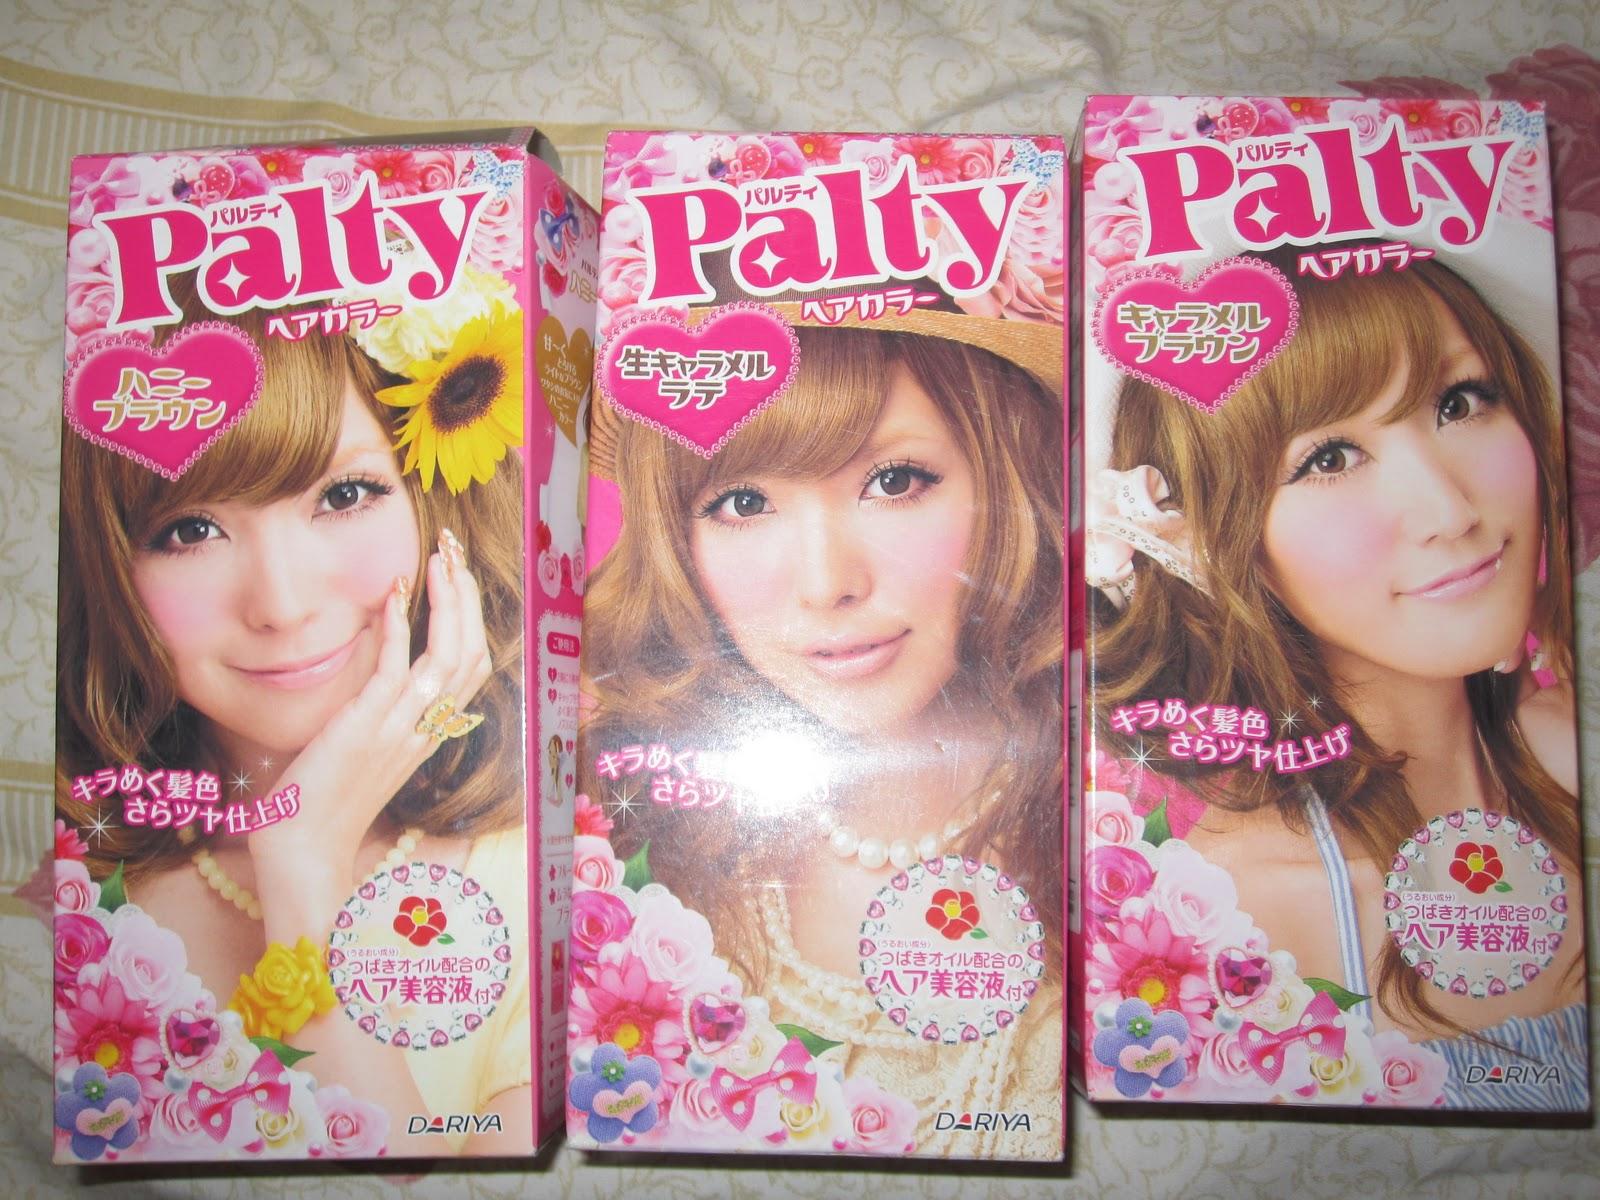 Palty Japanese Hair Dye Bettyc16